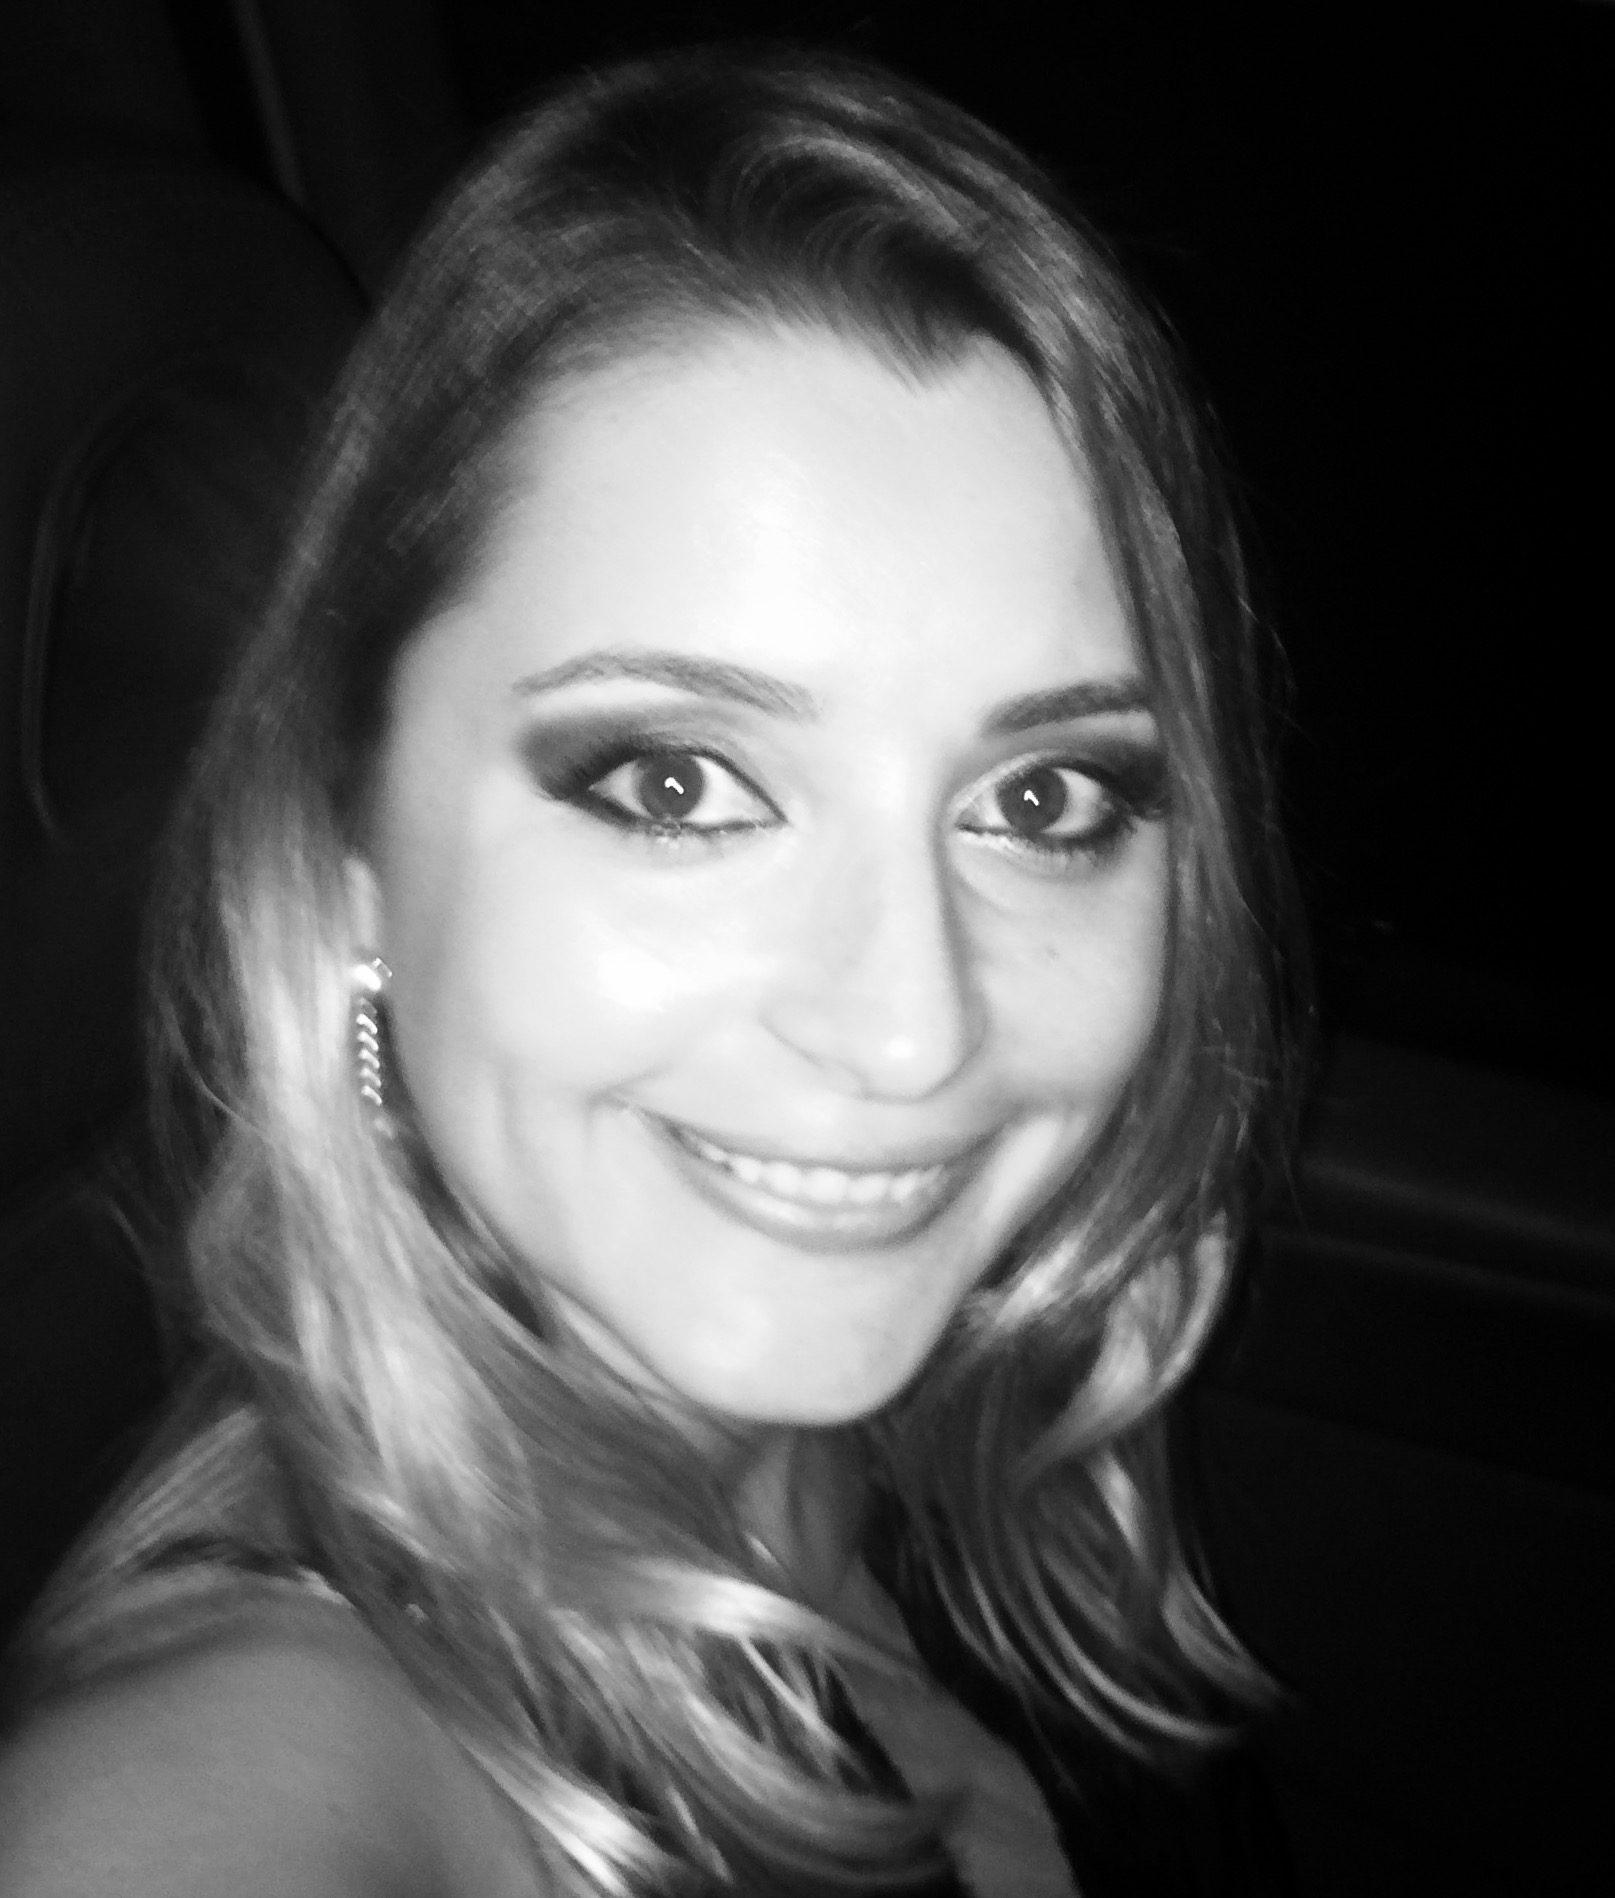 Fabiola de Oliveira Neves